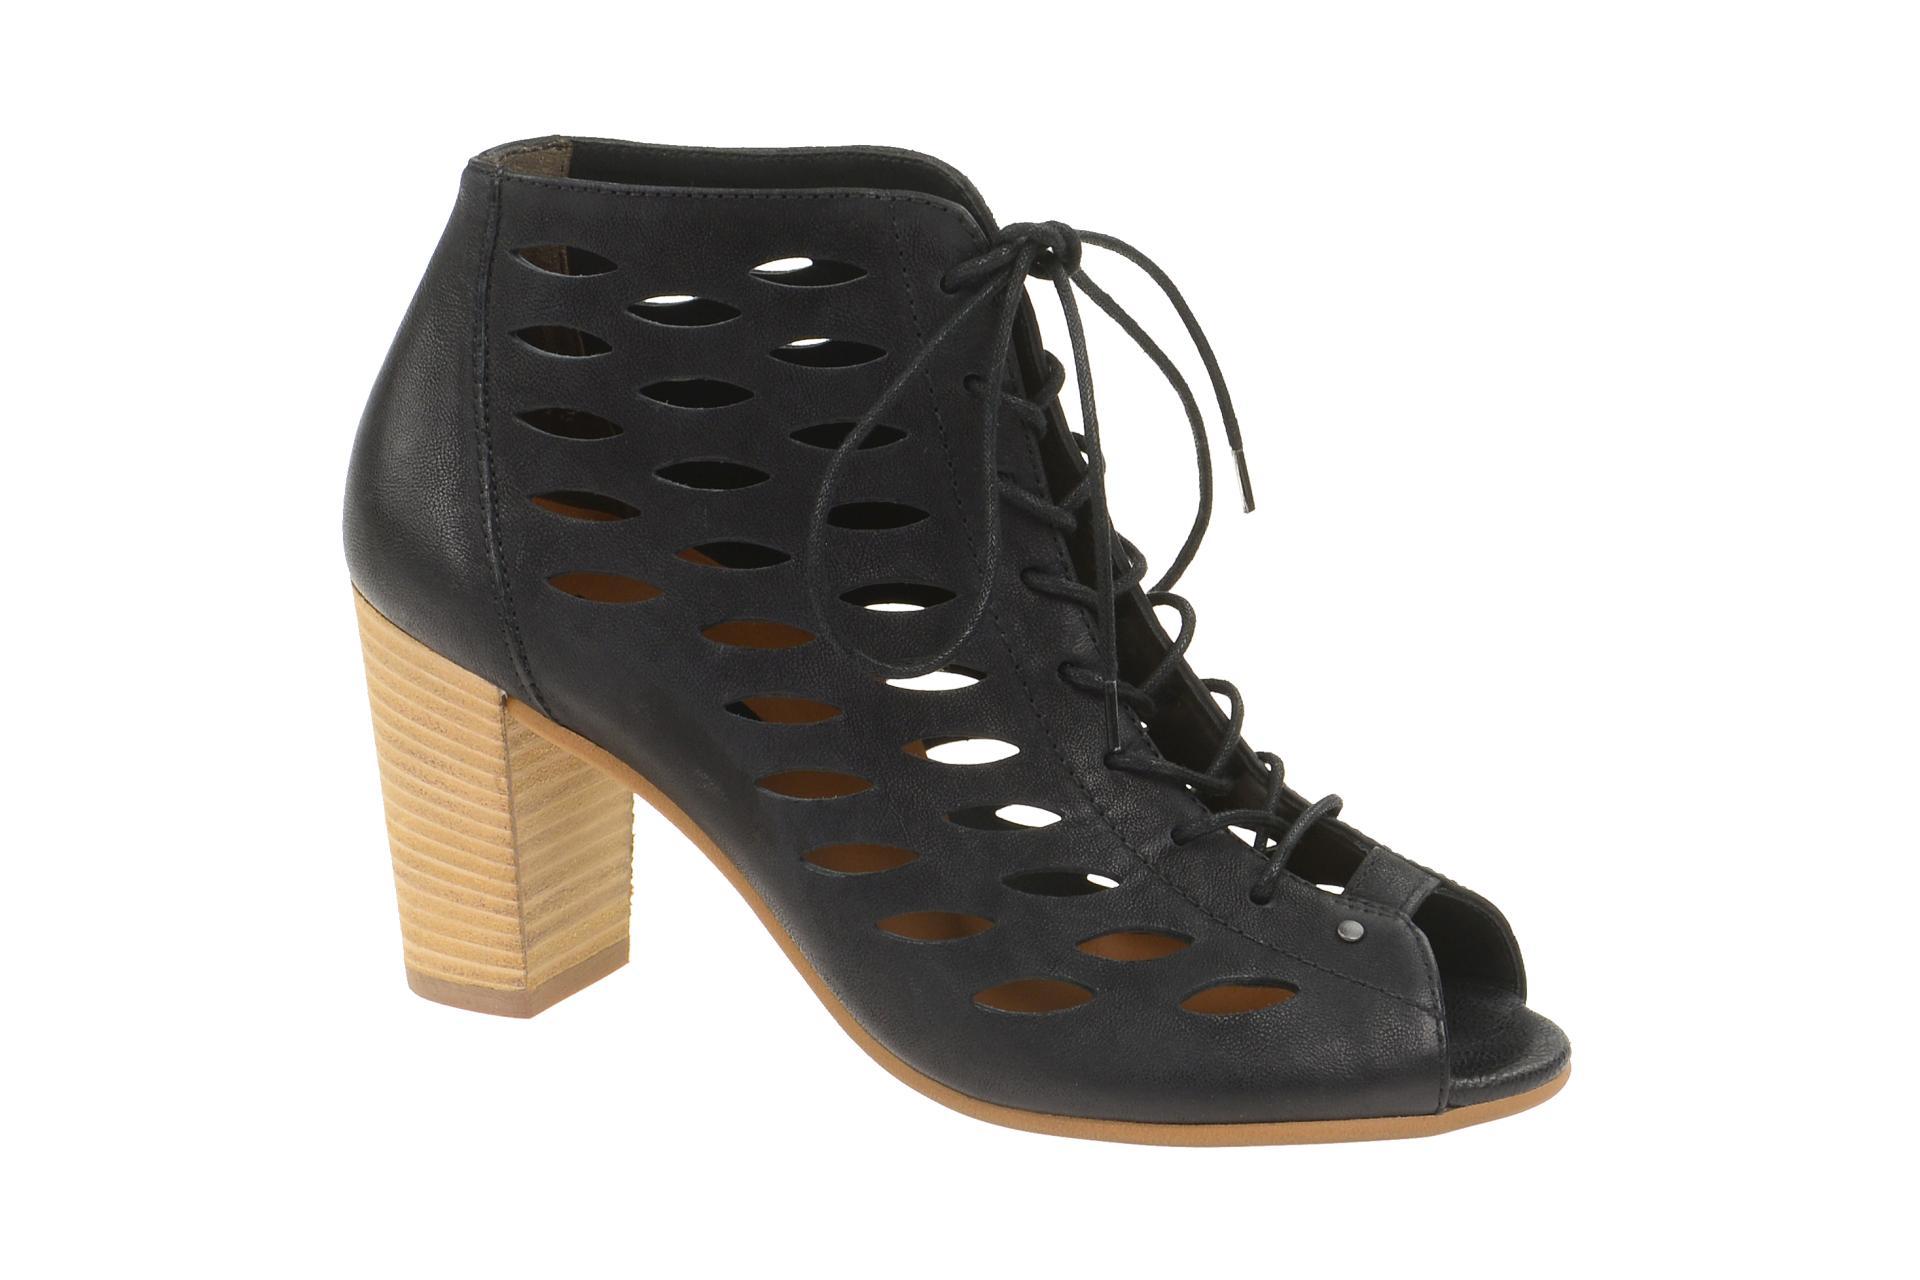 competitive price 769a7 dbe67 Details zu Paul Green Schuhe 6472 schwarz Damen Sandale Sandaletten  6472-025 NEU